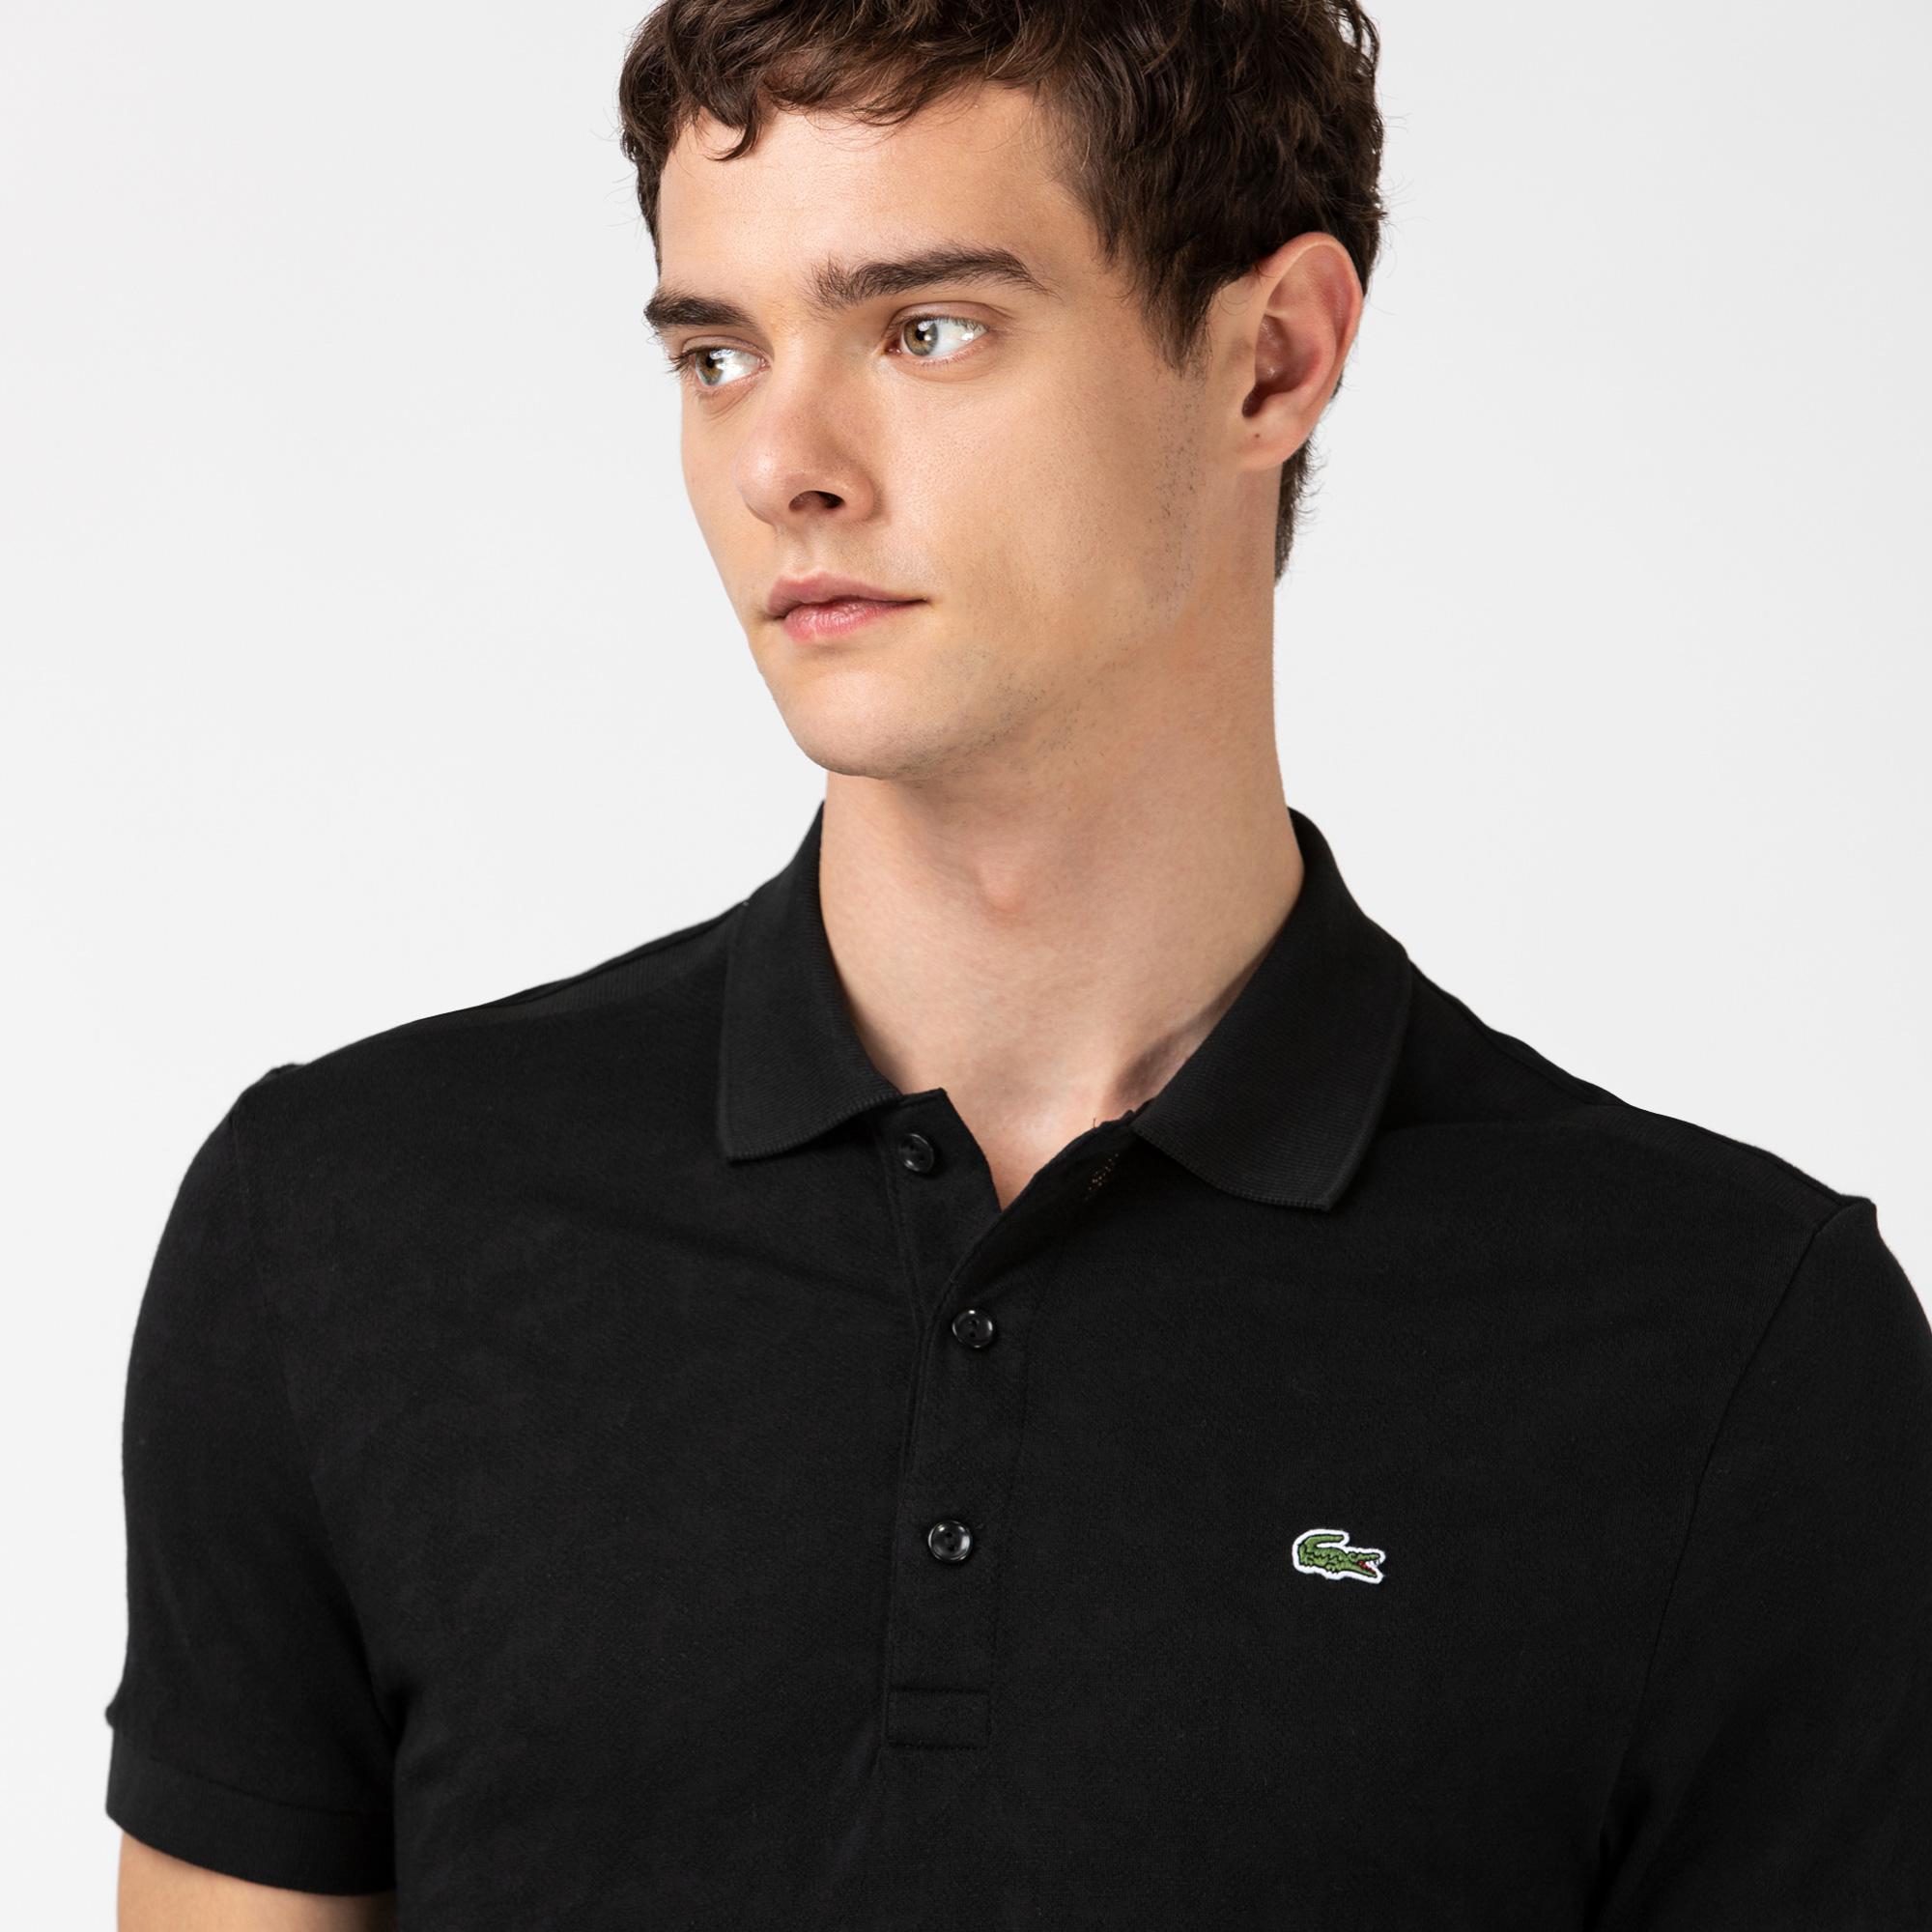 Lacoste Erkek Slim Fit Desenli Siyah Polo